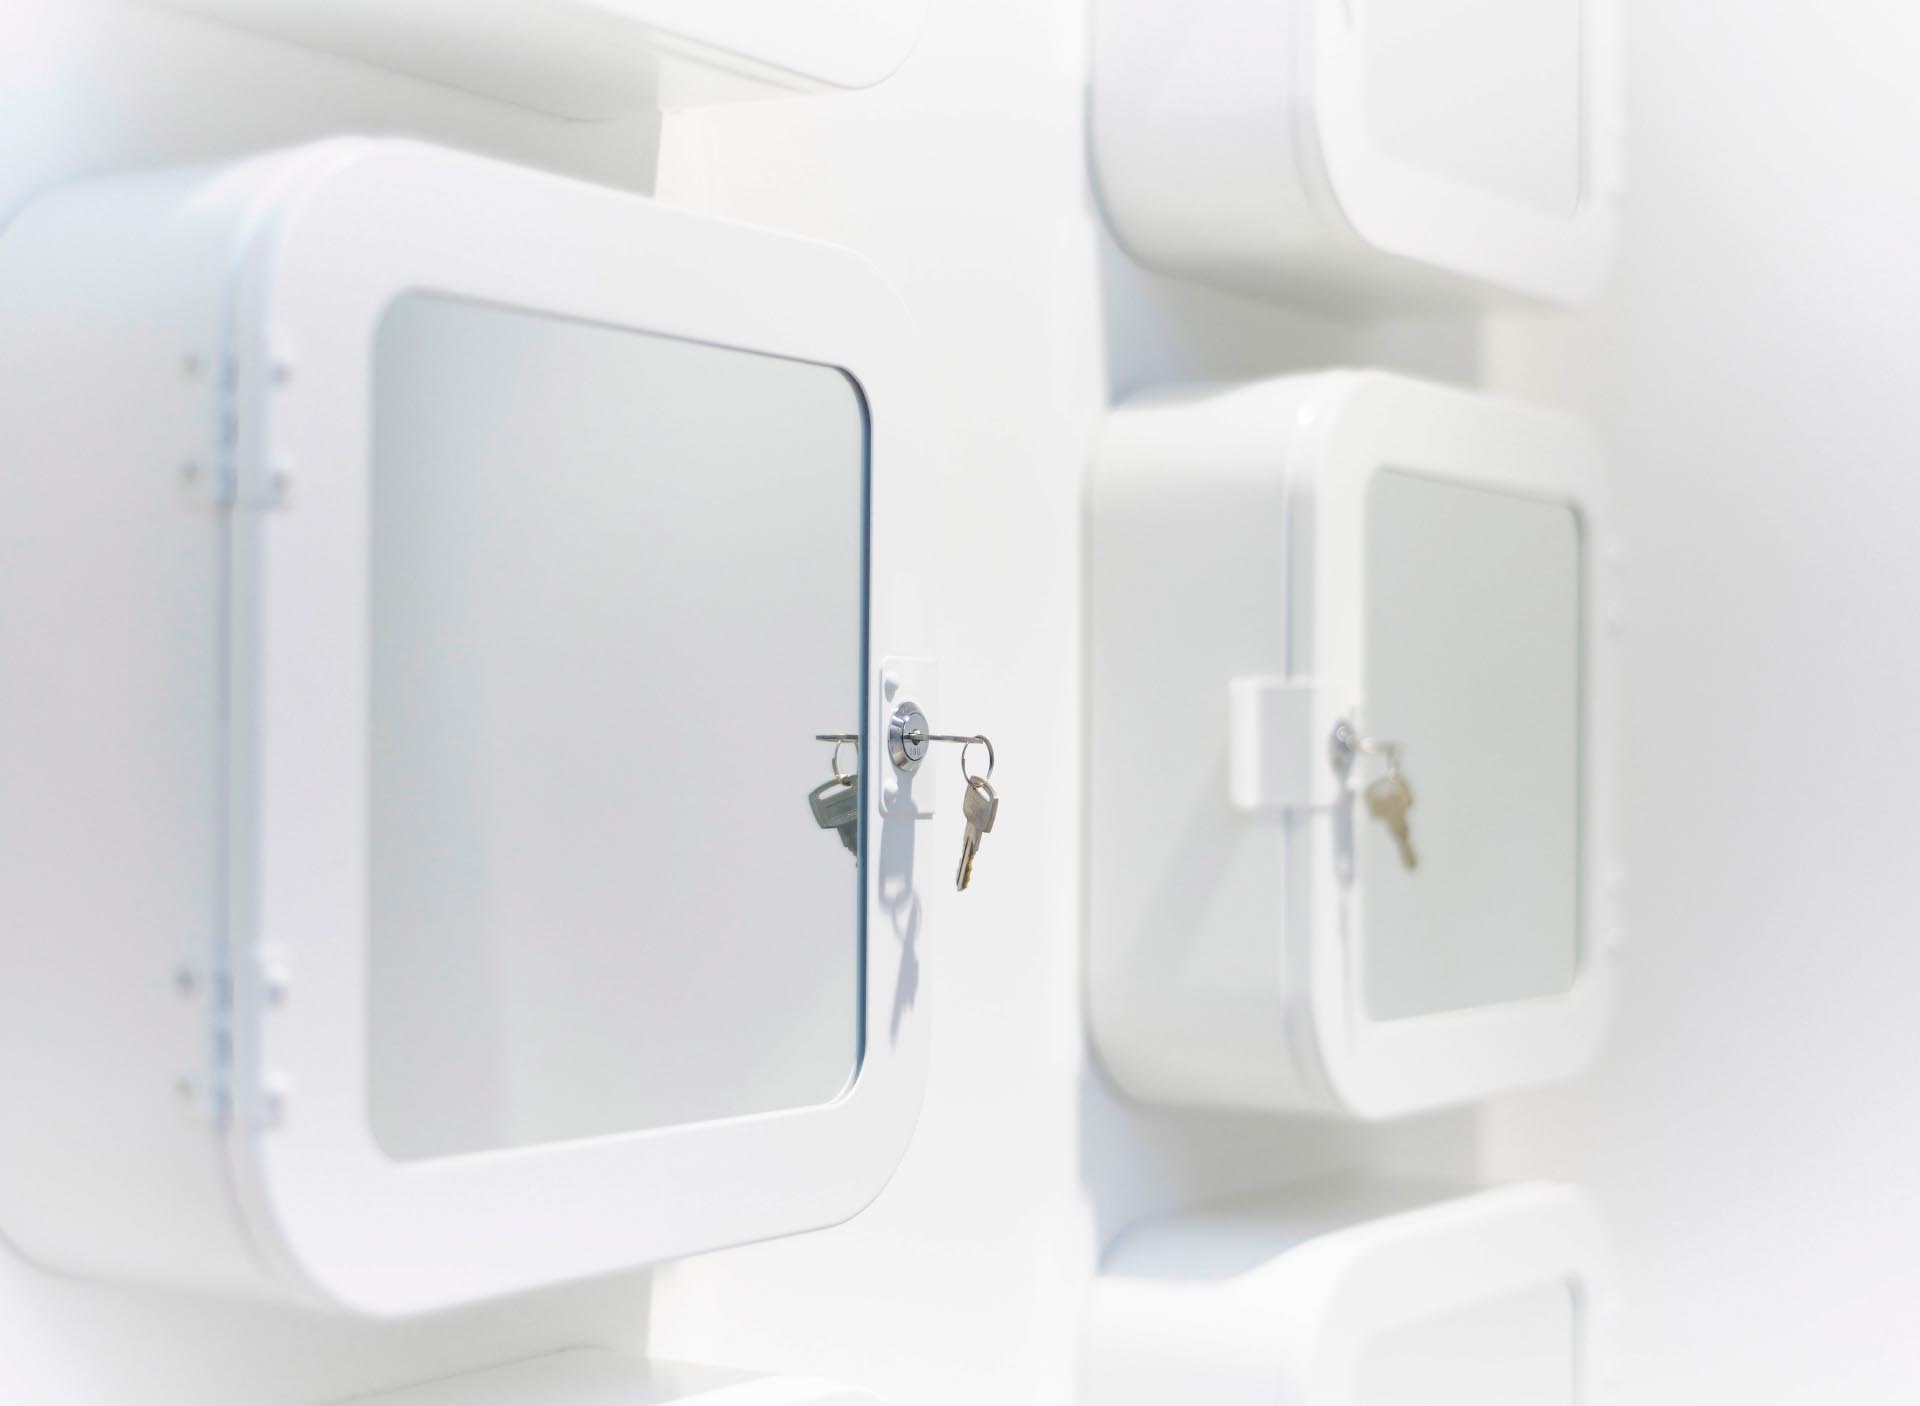 Champneys-Tring-Spa-Design-Changing-Lockers